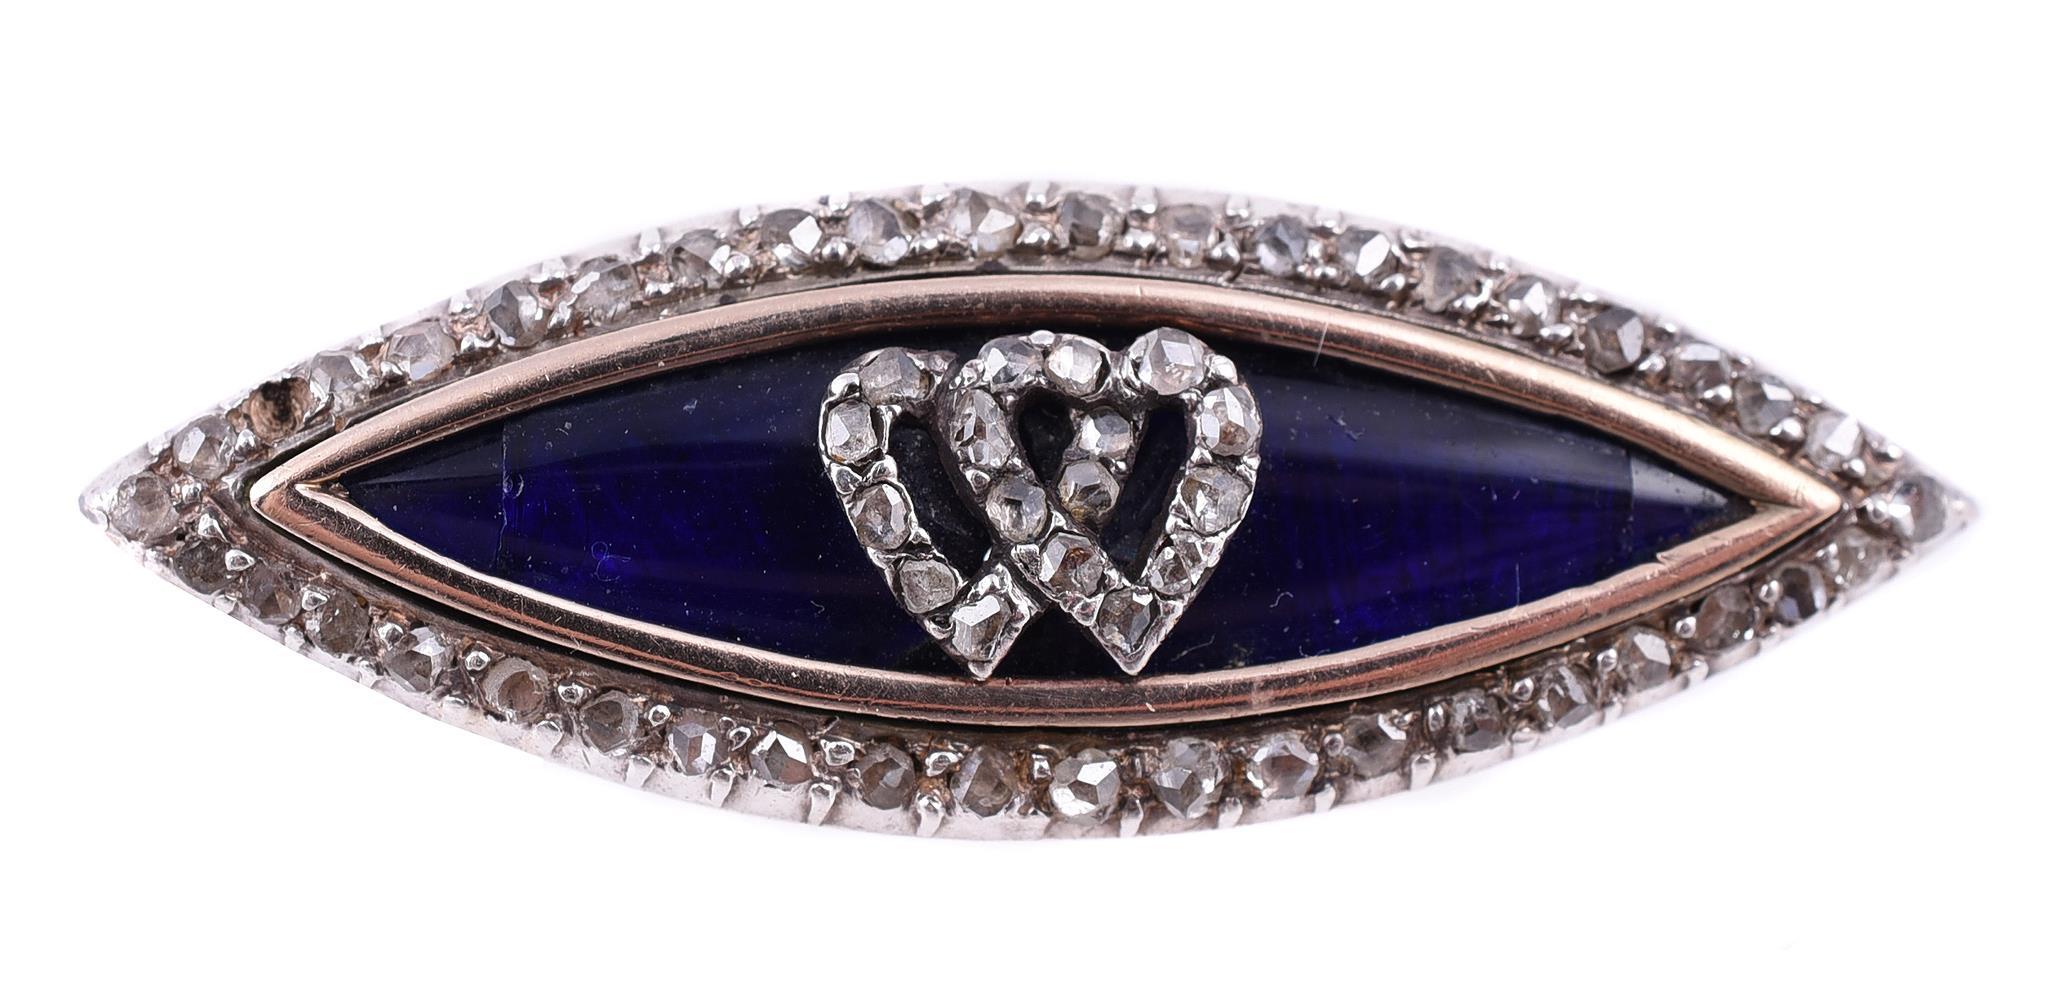 A navette shaped rose cut diamond and blue enamel brooch